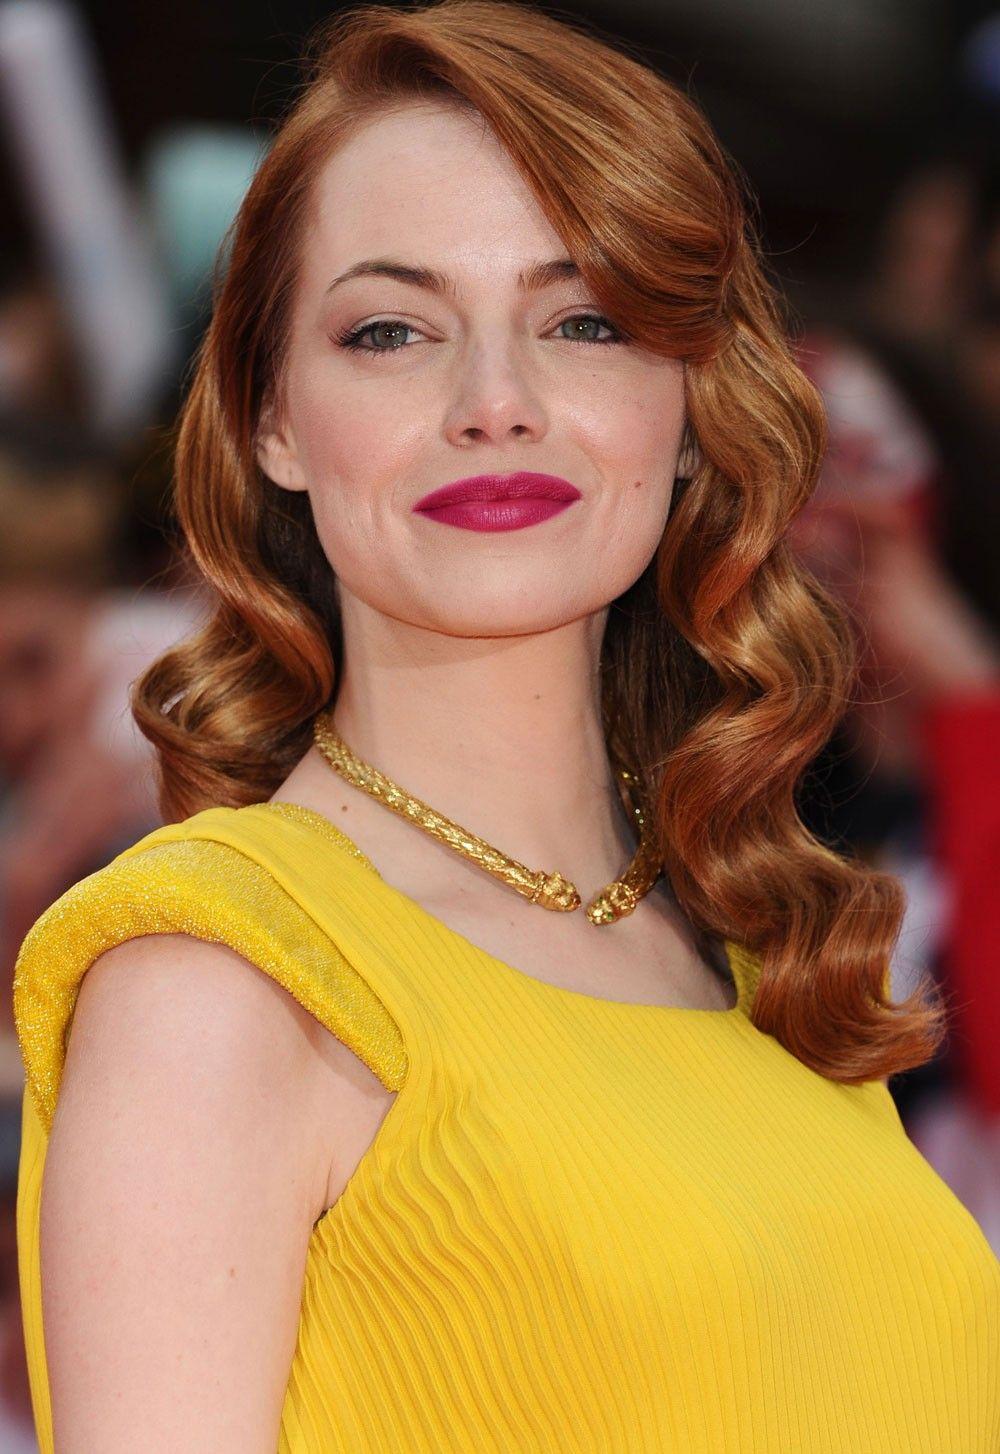 Hair Updos 2016 For Red Carpet Hairstyles Medium Hair Styles Hair Styles Curly Hair Styles